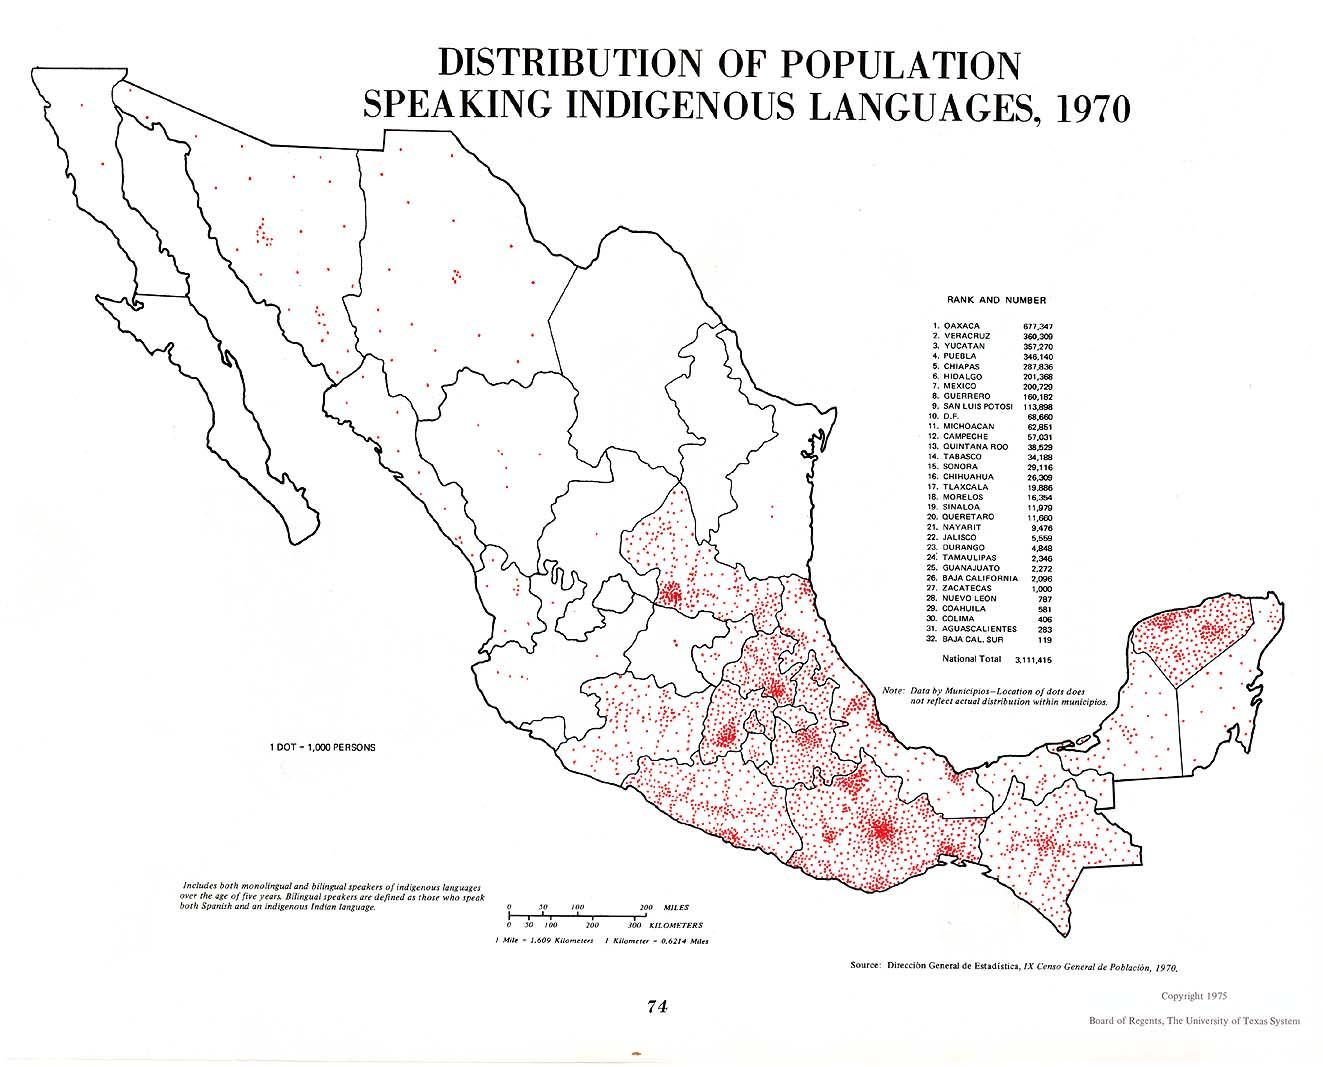 Lenguas Indígenas, México 1970